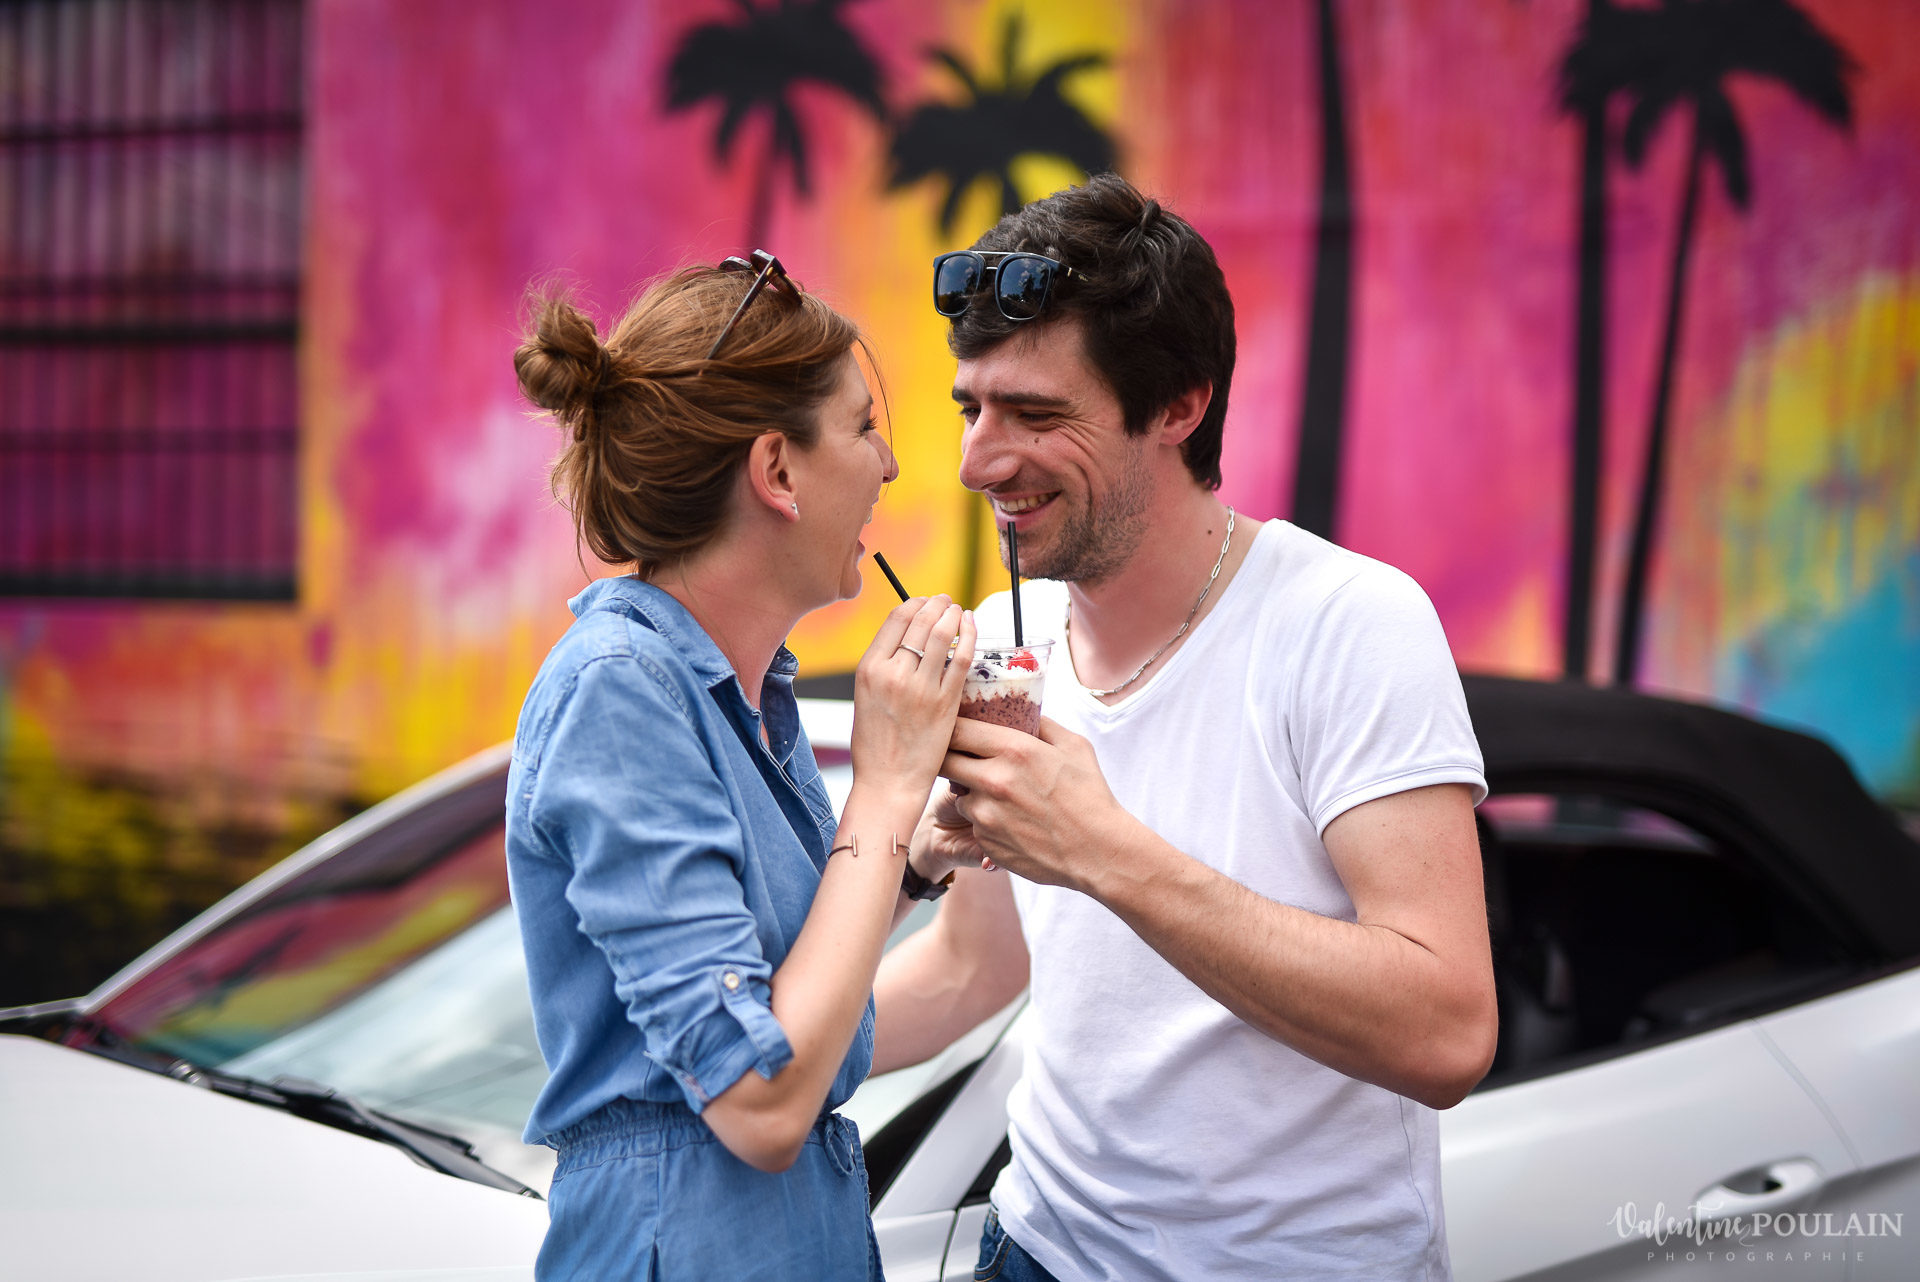 Couple Miami Wynwood - Valentine Poulain pailles